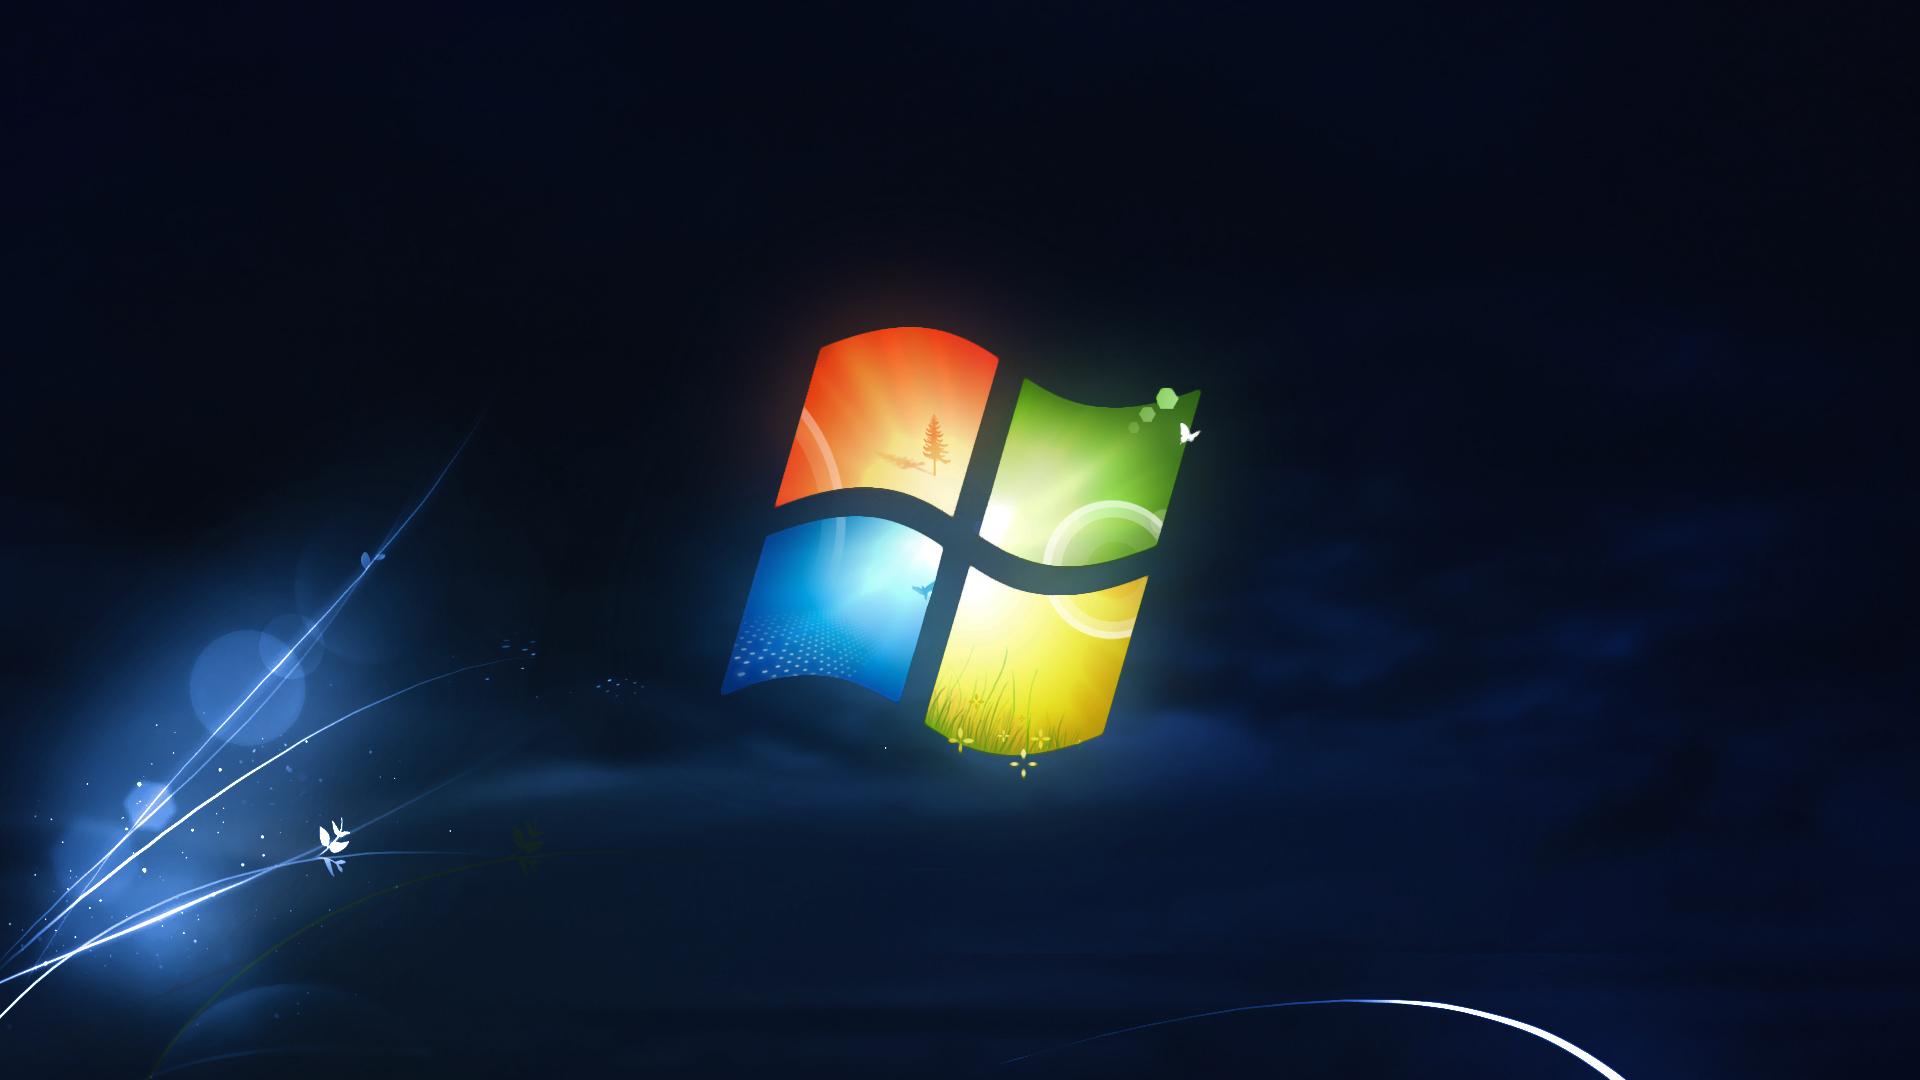 Download Wallpapers Windows 7 4k Se7en Blue Background: Microsoft Windows 10 Wallpaper Official